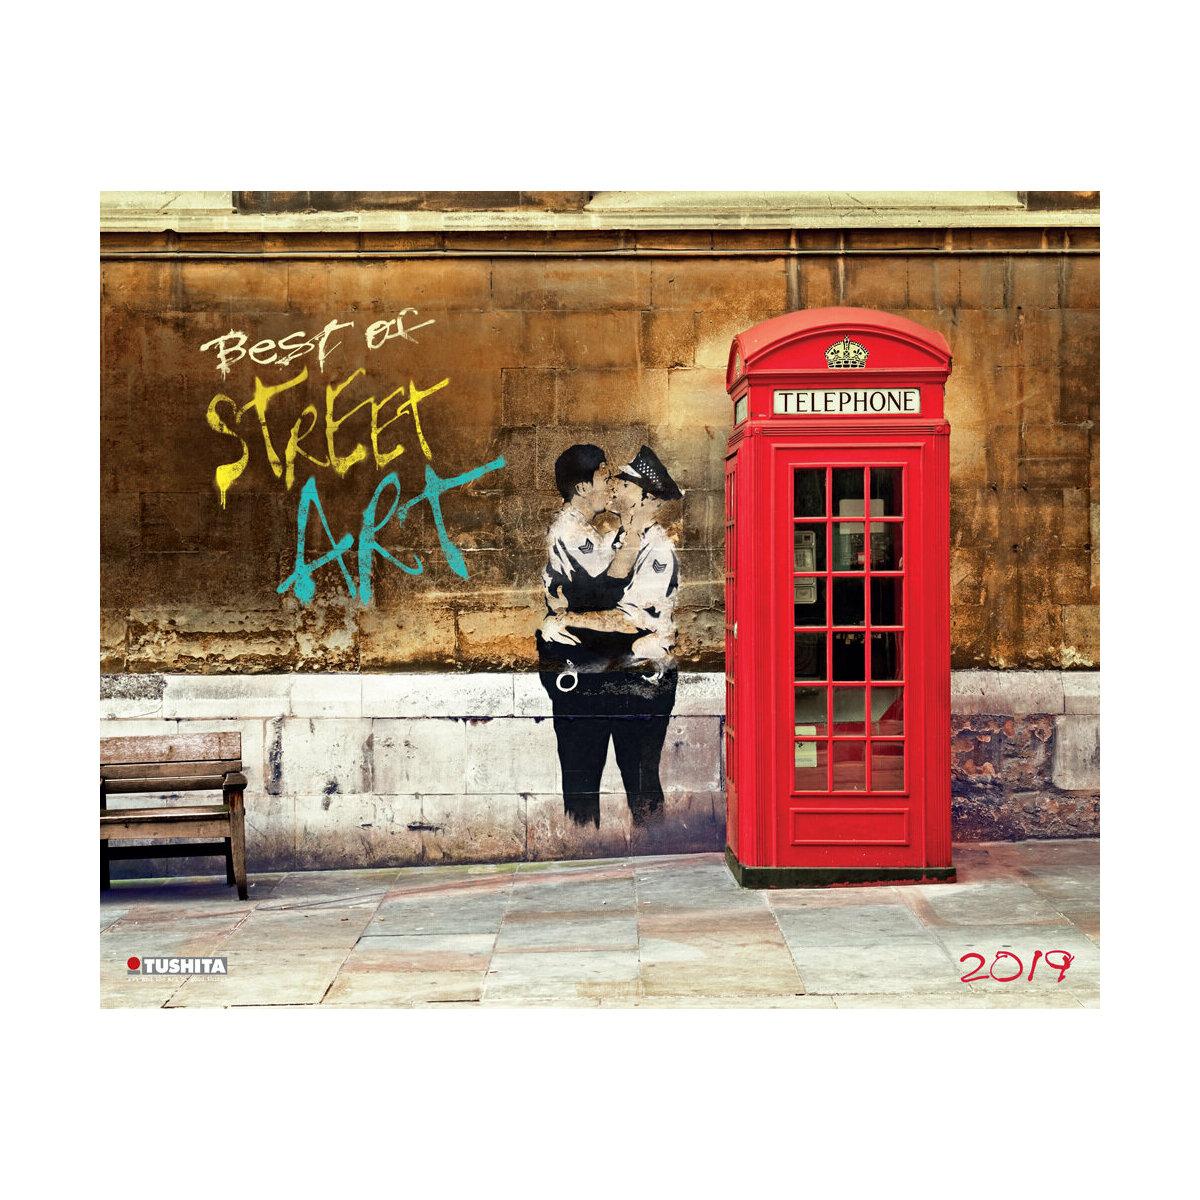 Calendrier Mural Grand Format.Maxi Calendrier 2019 Street Art Art Urbain Maxi Grand Format